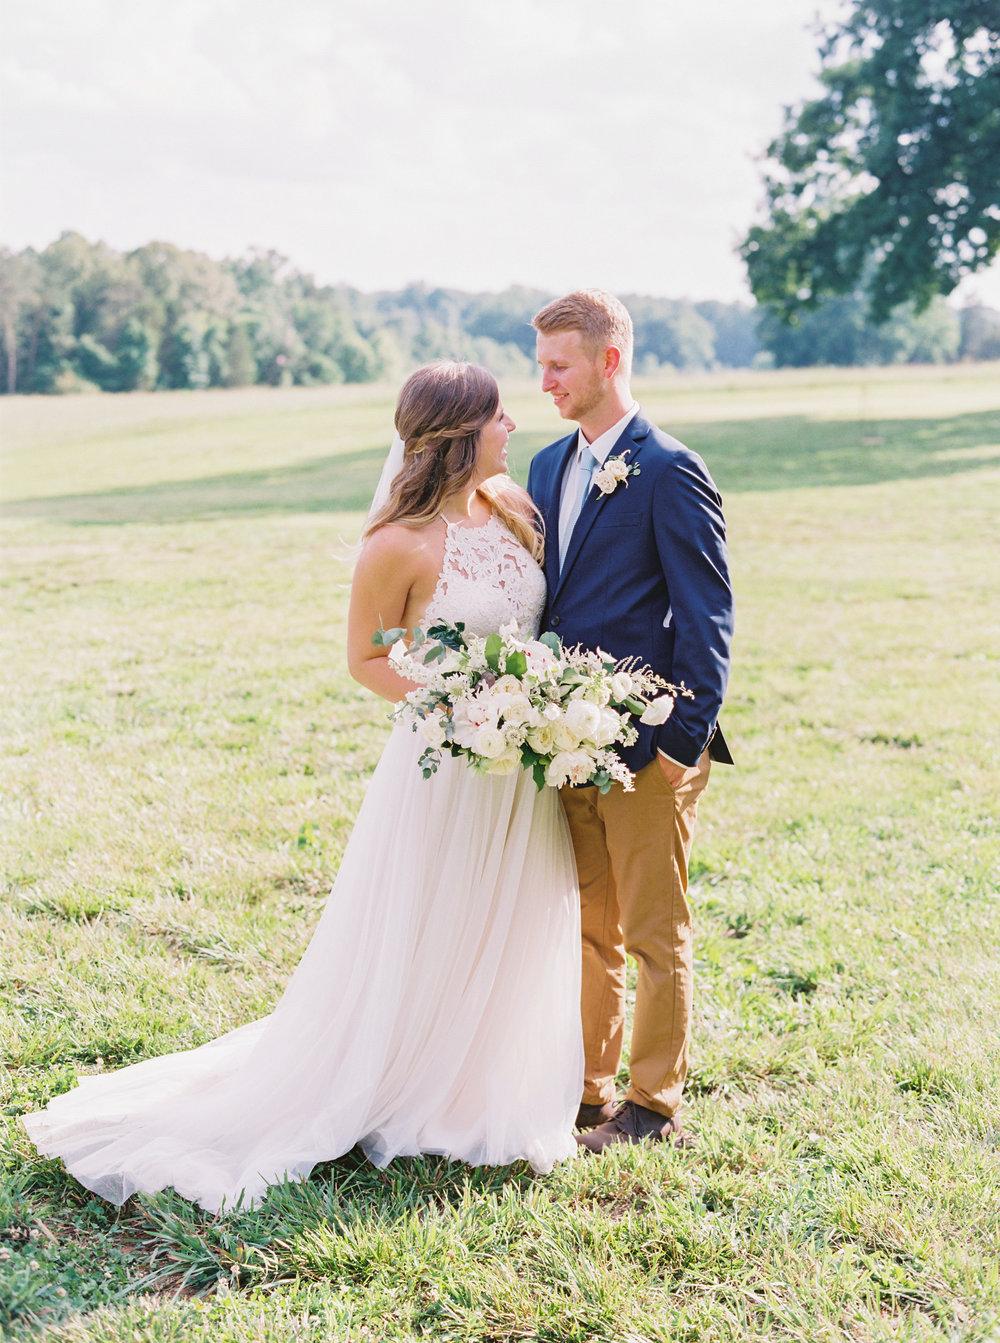 Claire+Patrick_Wedding-396.jpg